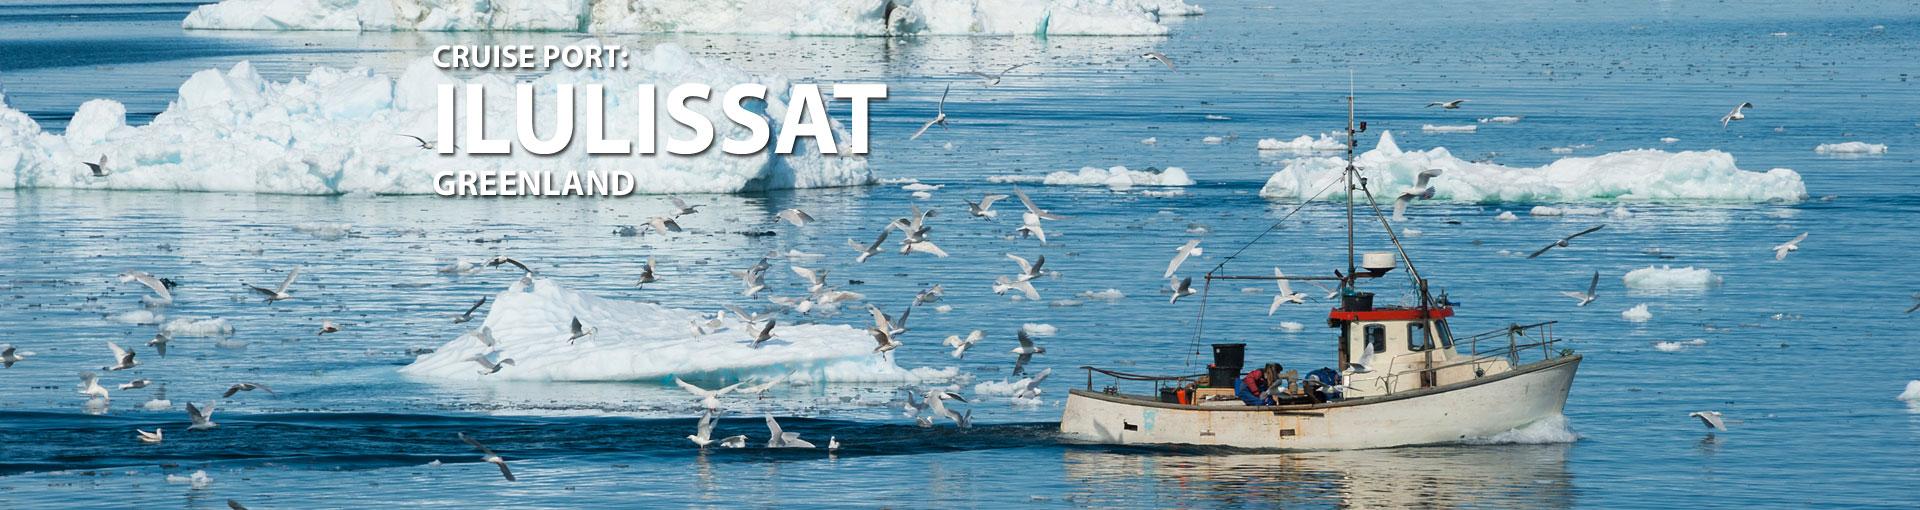 Cruises to Ilulissat, Greenland